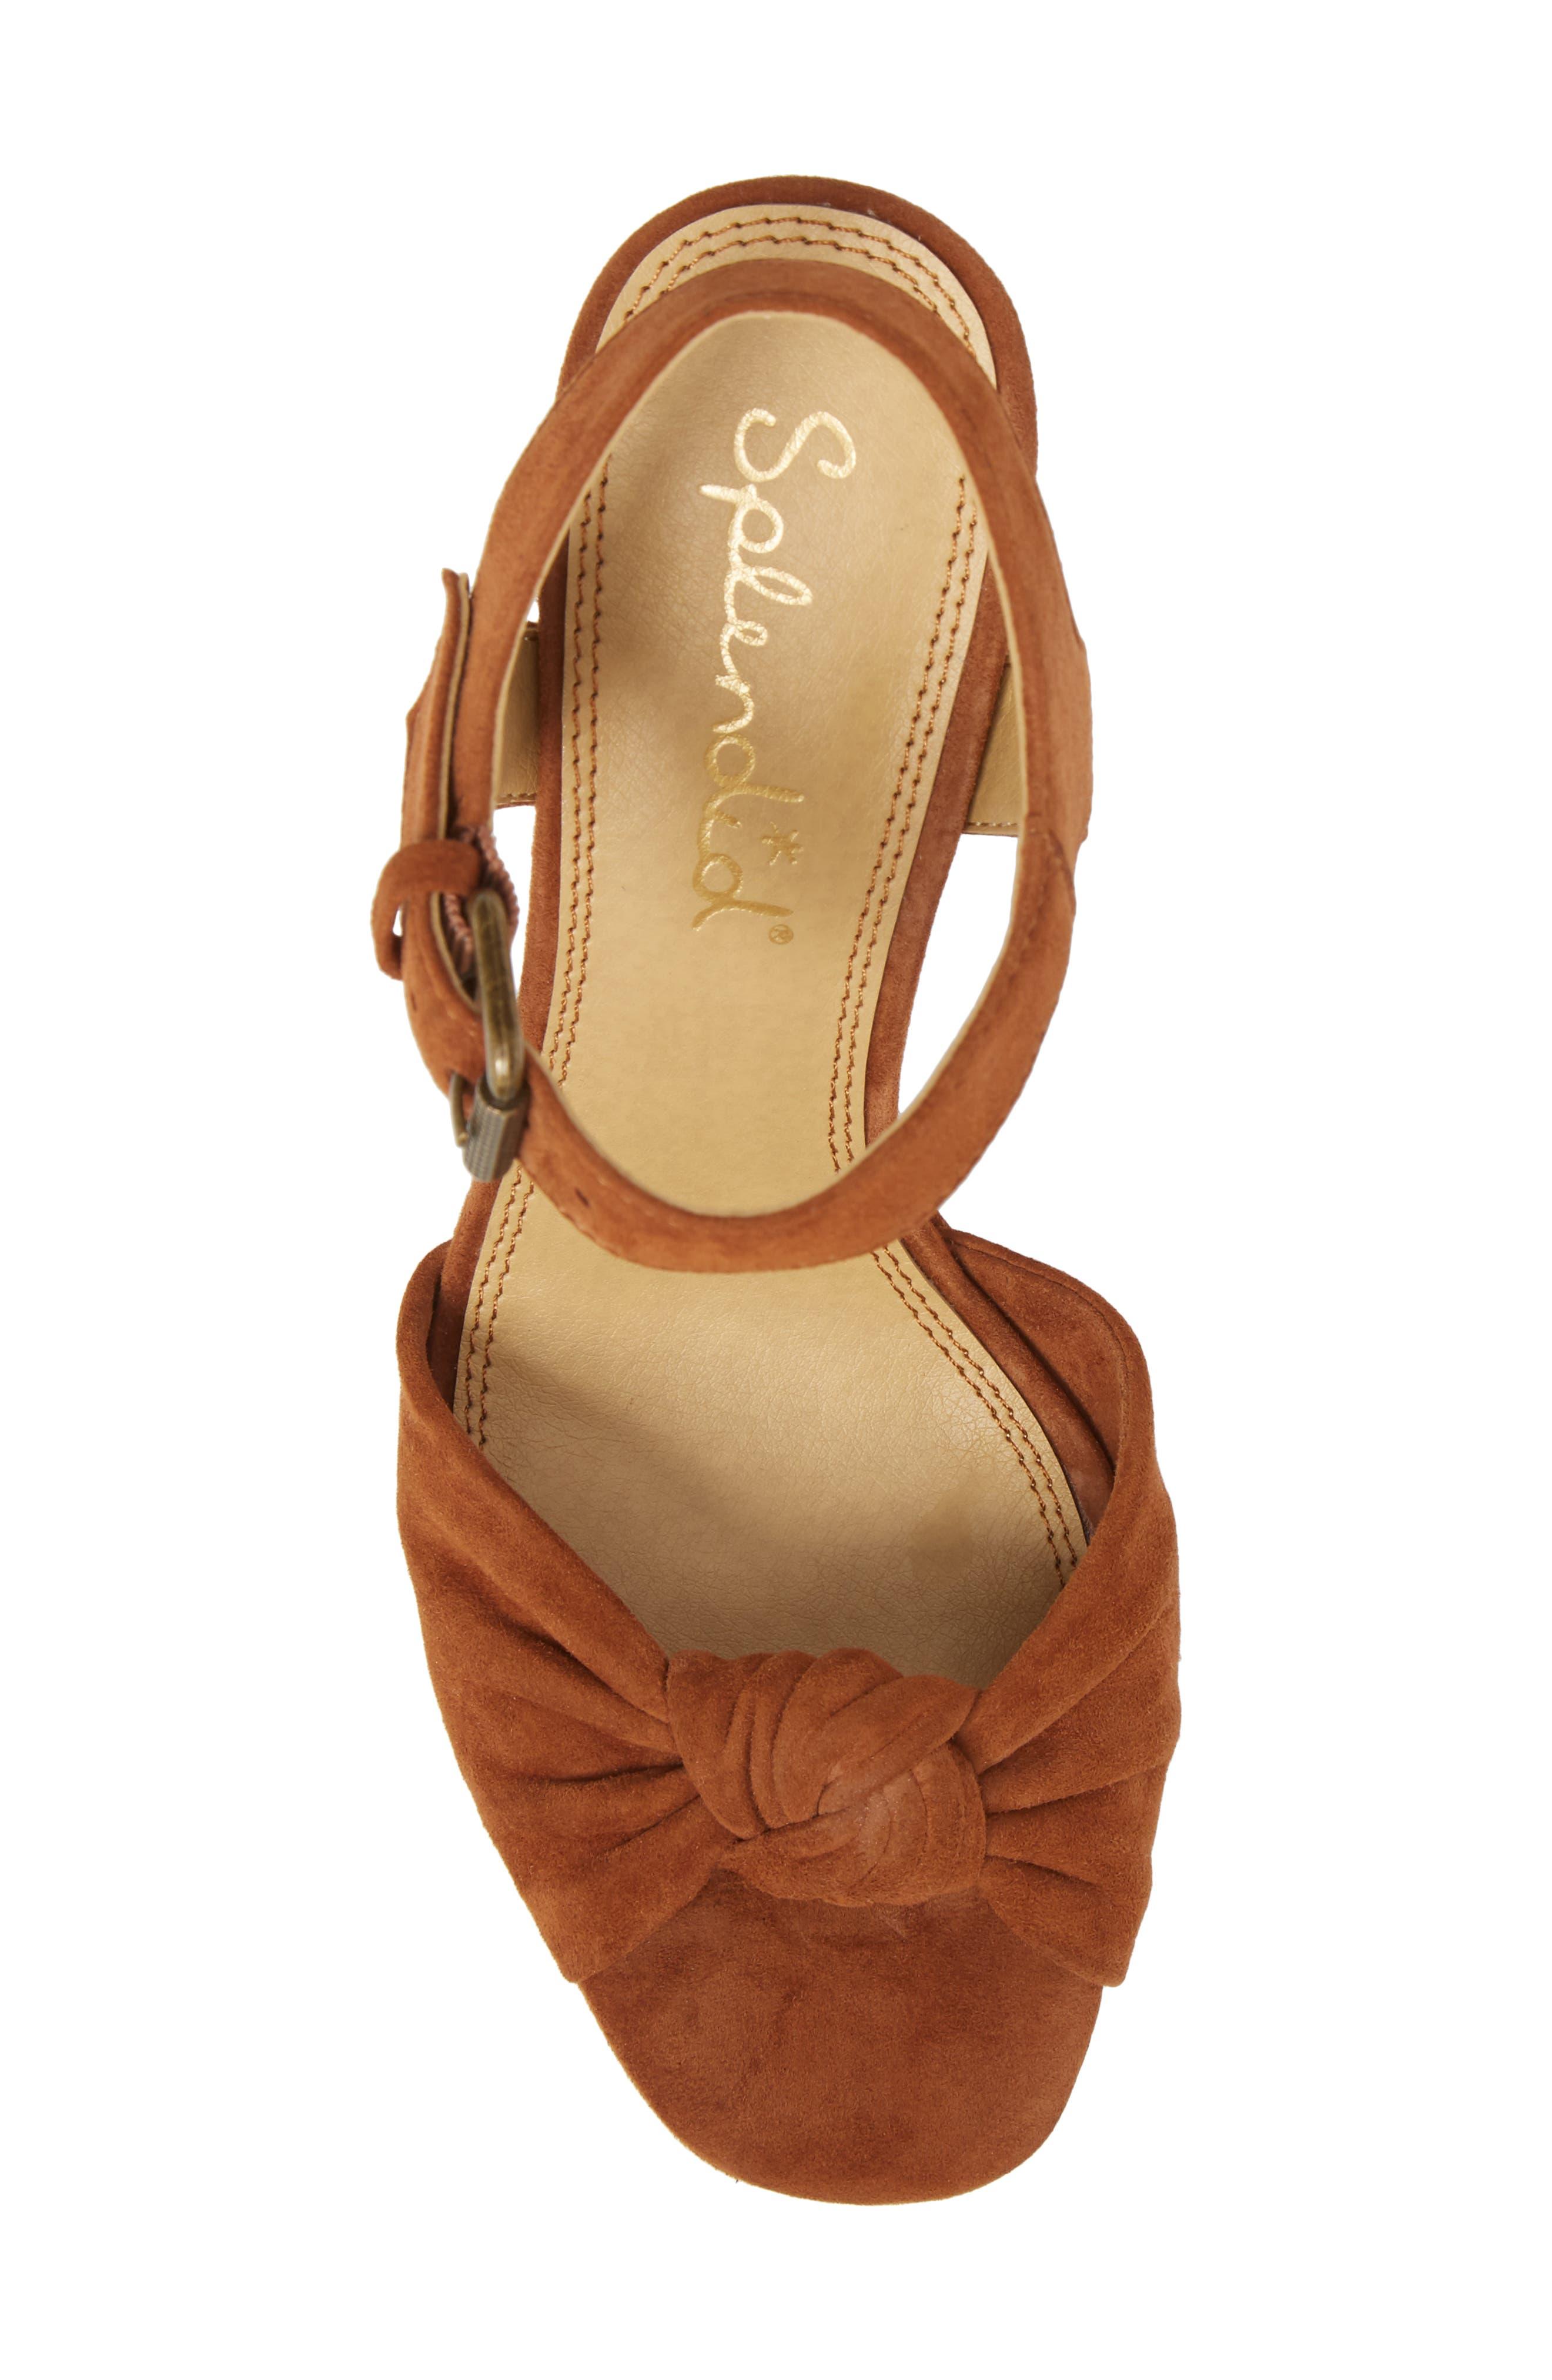 Bates Platform Sandal,                             Alternate thumbnail 5, color,                             Caramel Suede